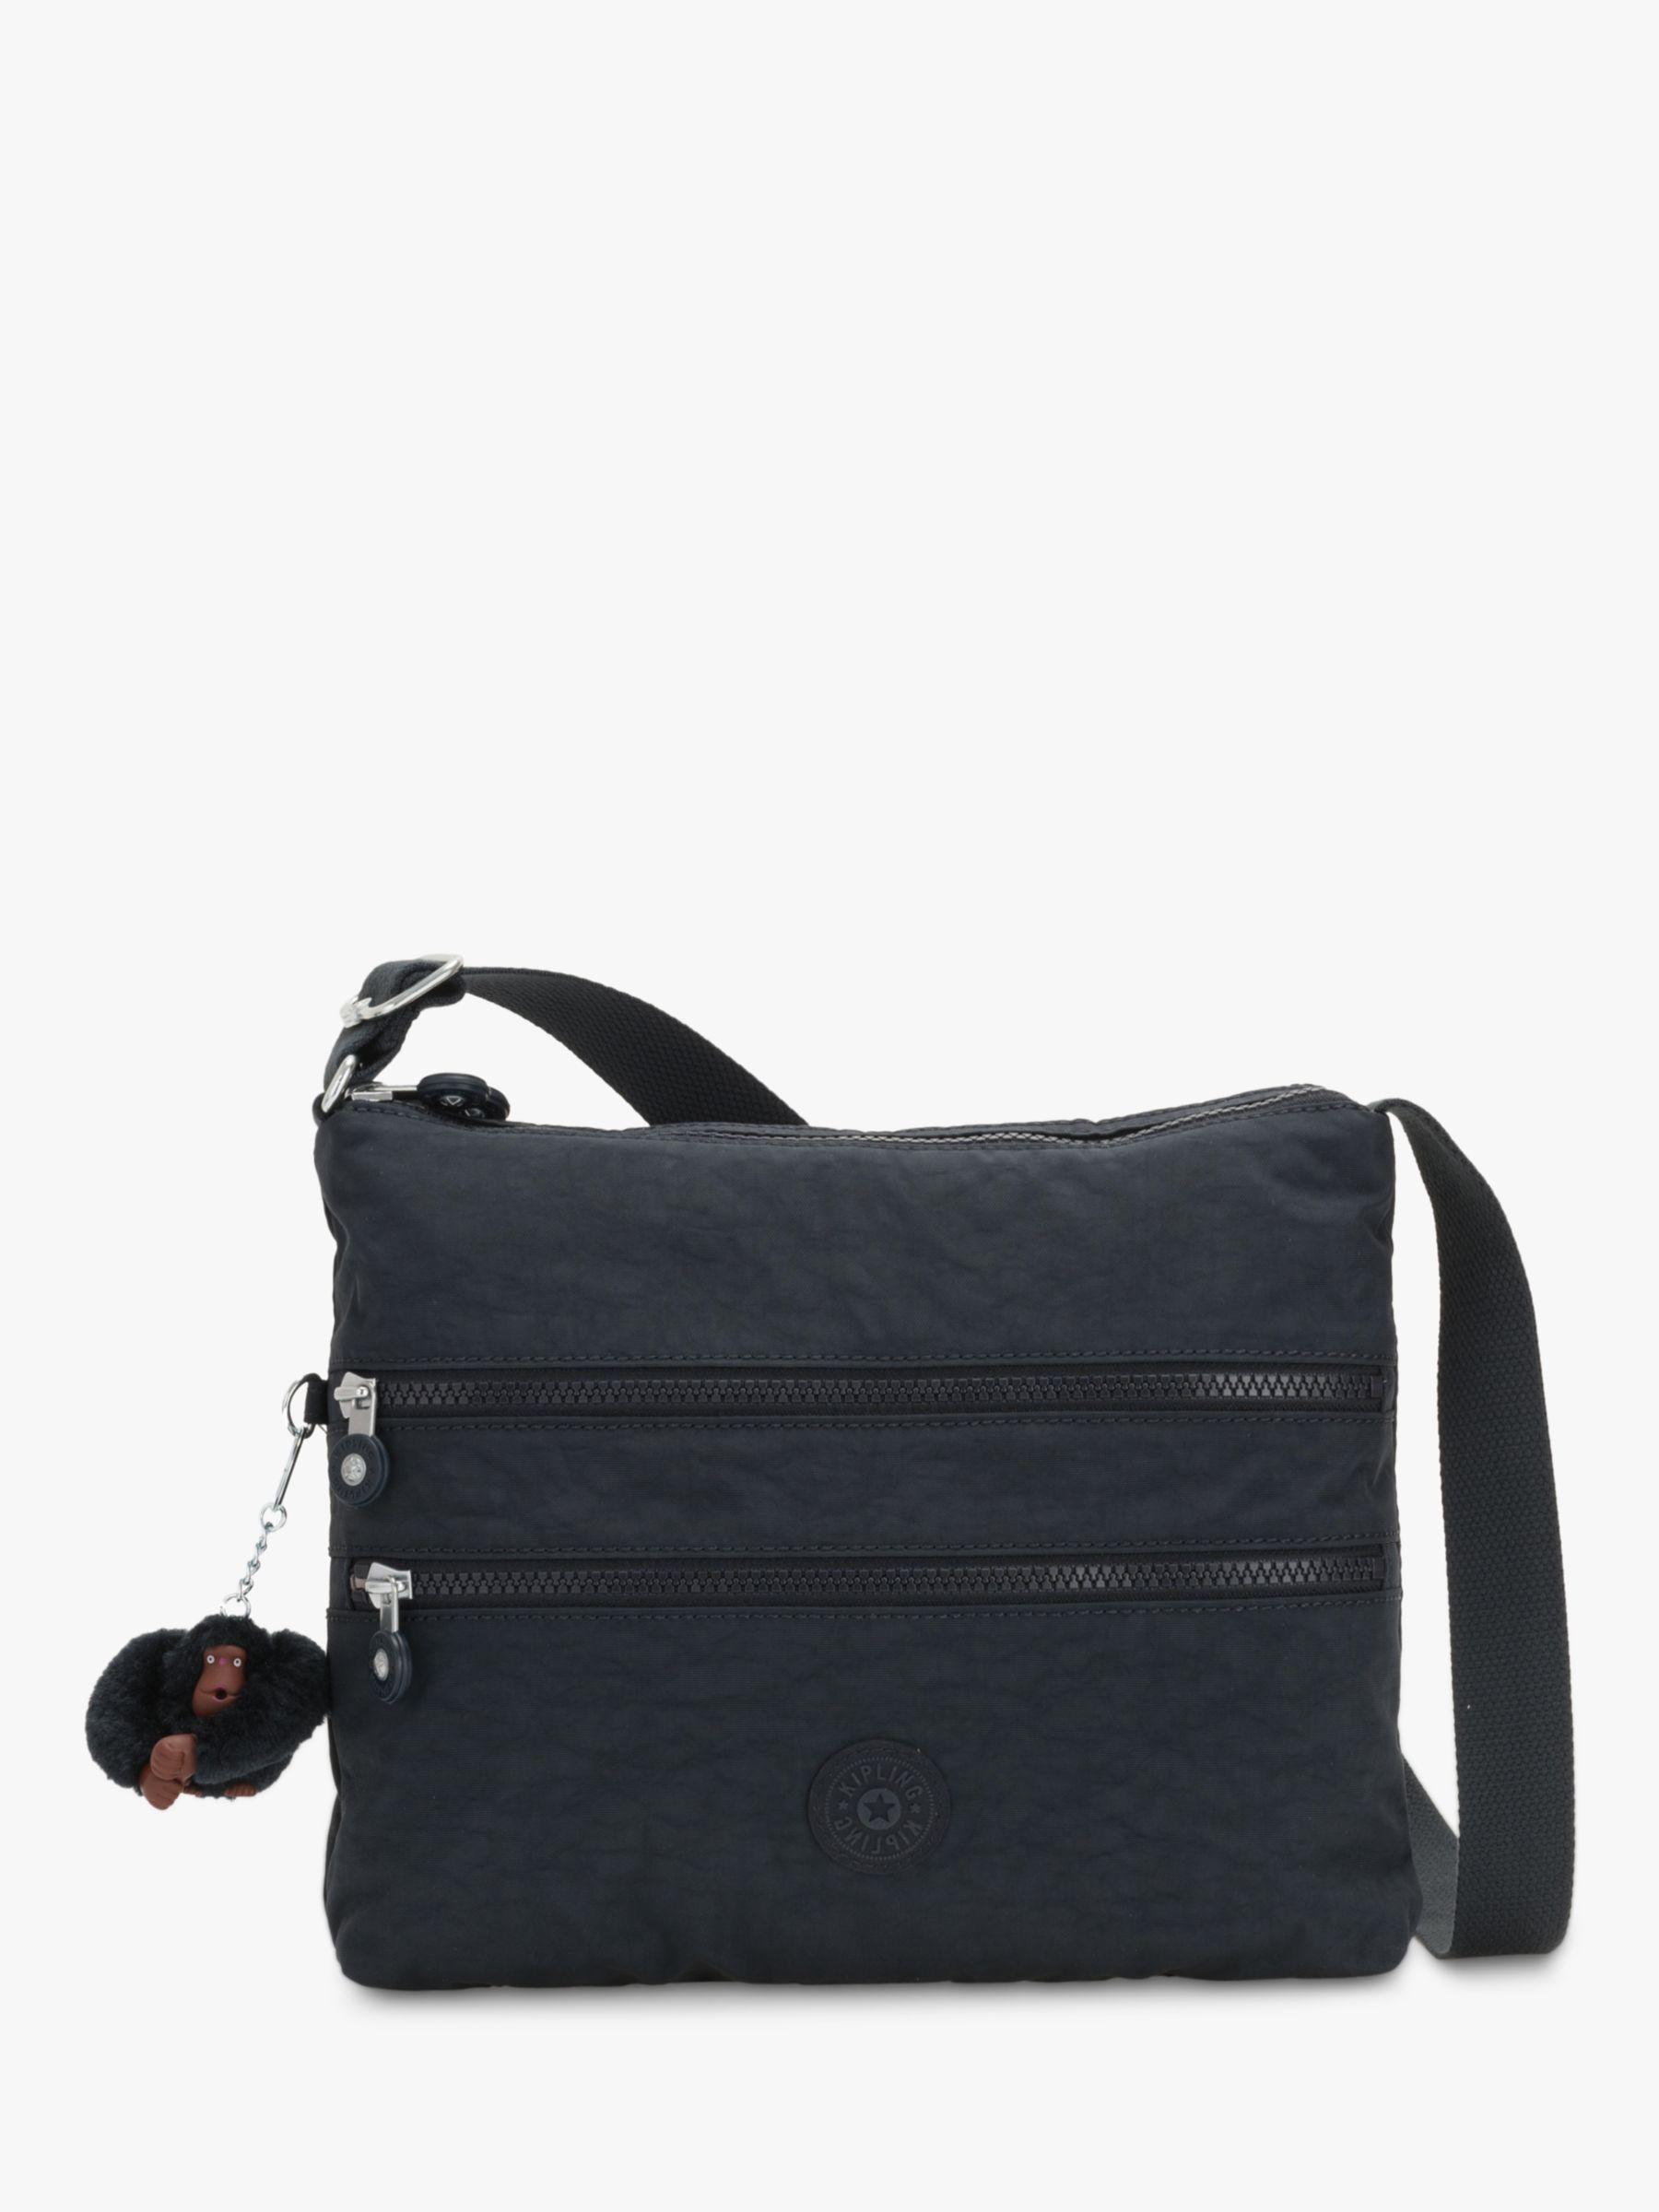 Kipling Kipling Alvar Medium Shoulder Bag